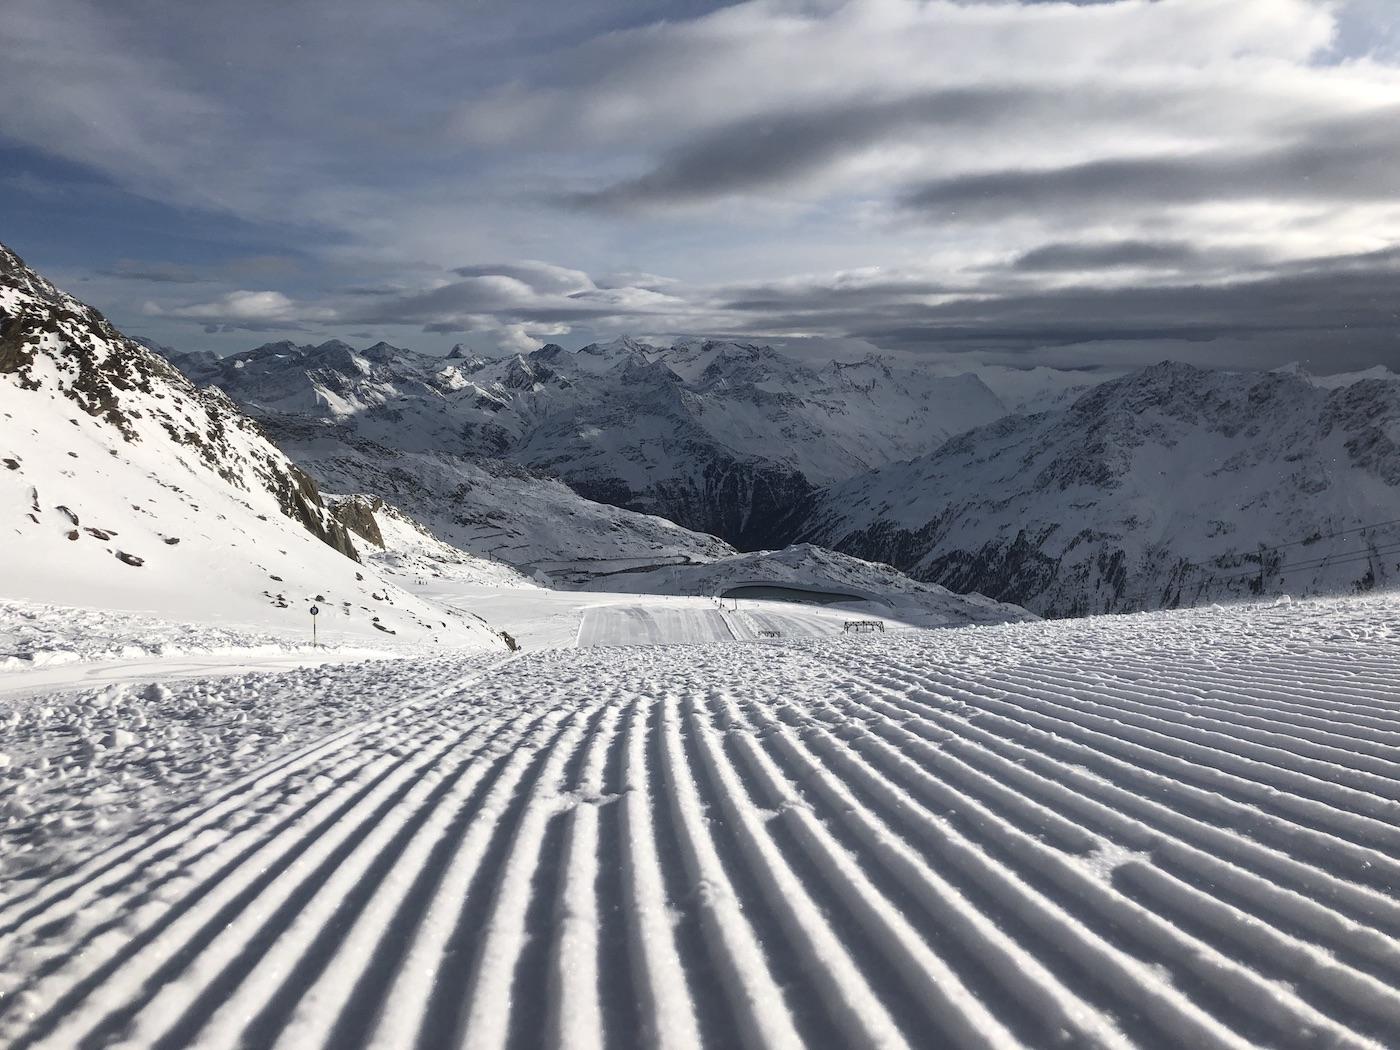 sneeuw 2021/2022. Kun je skiën in oktober?